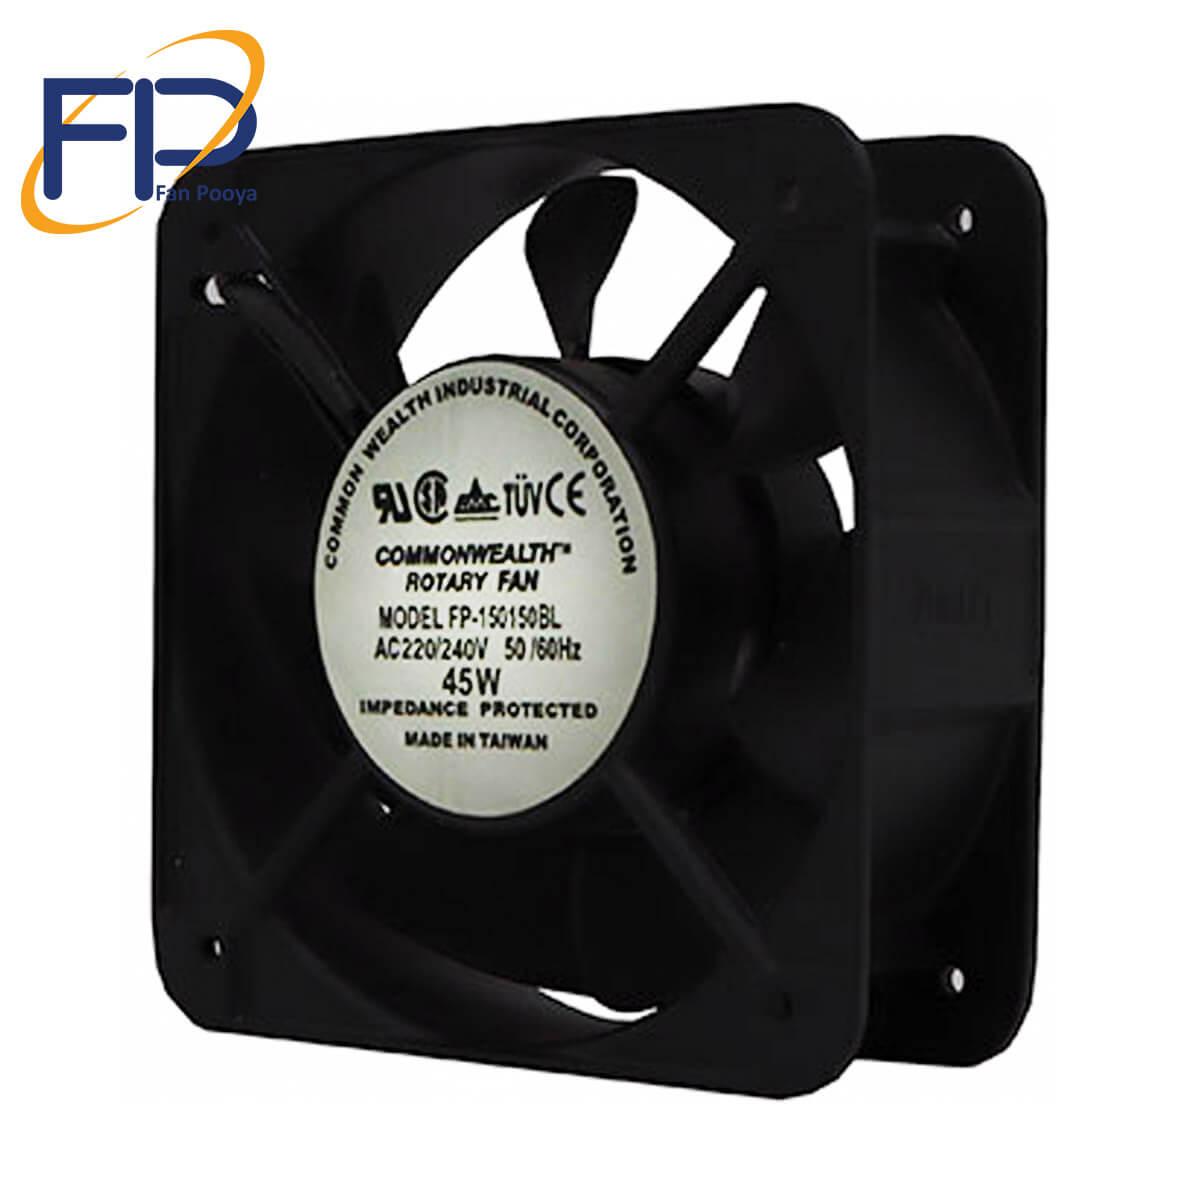 فن کامپیوتری15*15-(COMONWEALTH)-مدل FP150*150BL